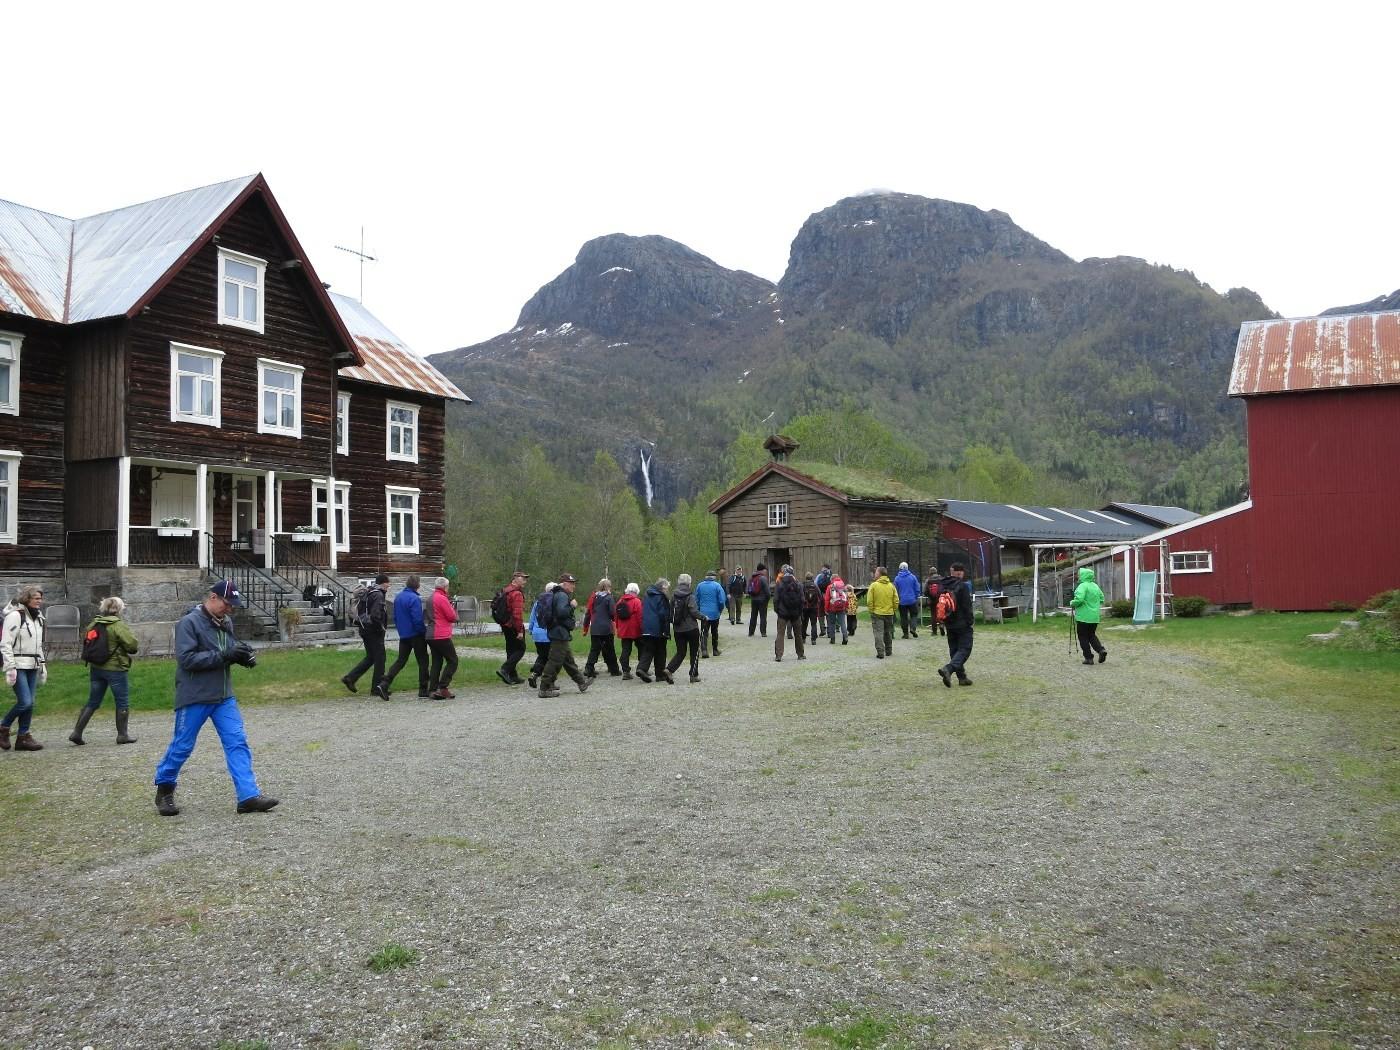 I helga inviterte historielaget til historisk vandring på Kårvatn.  Foto. Driva/Jon Olav Ørsal